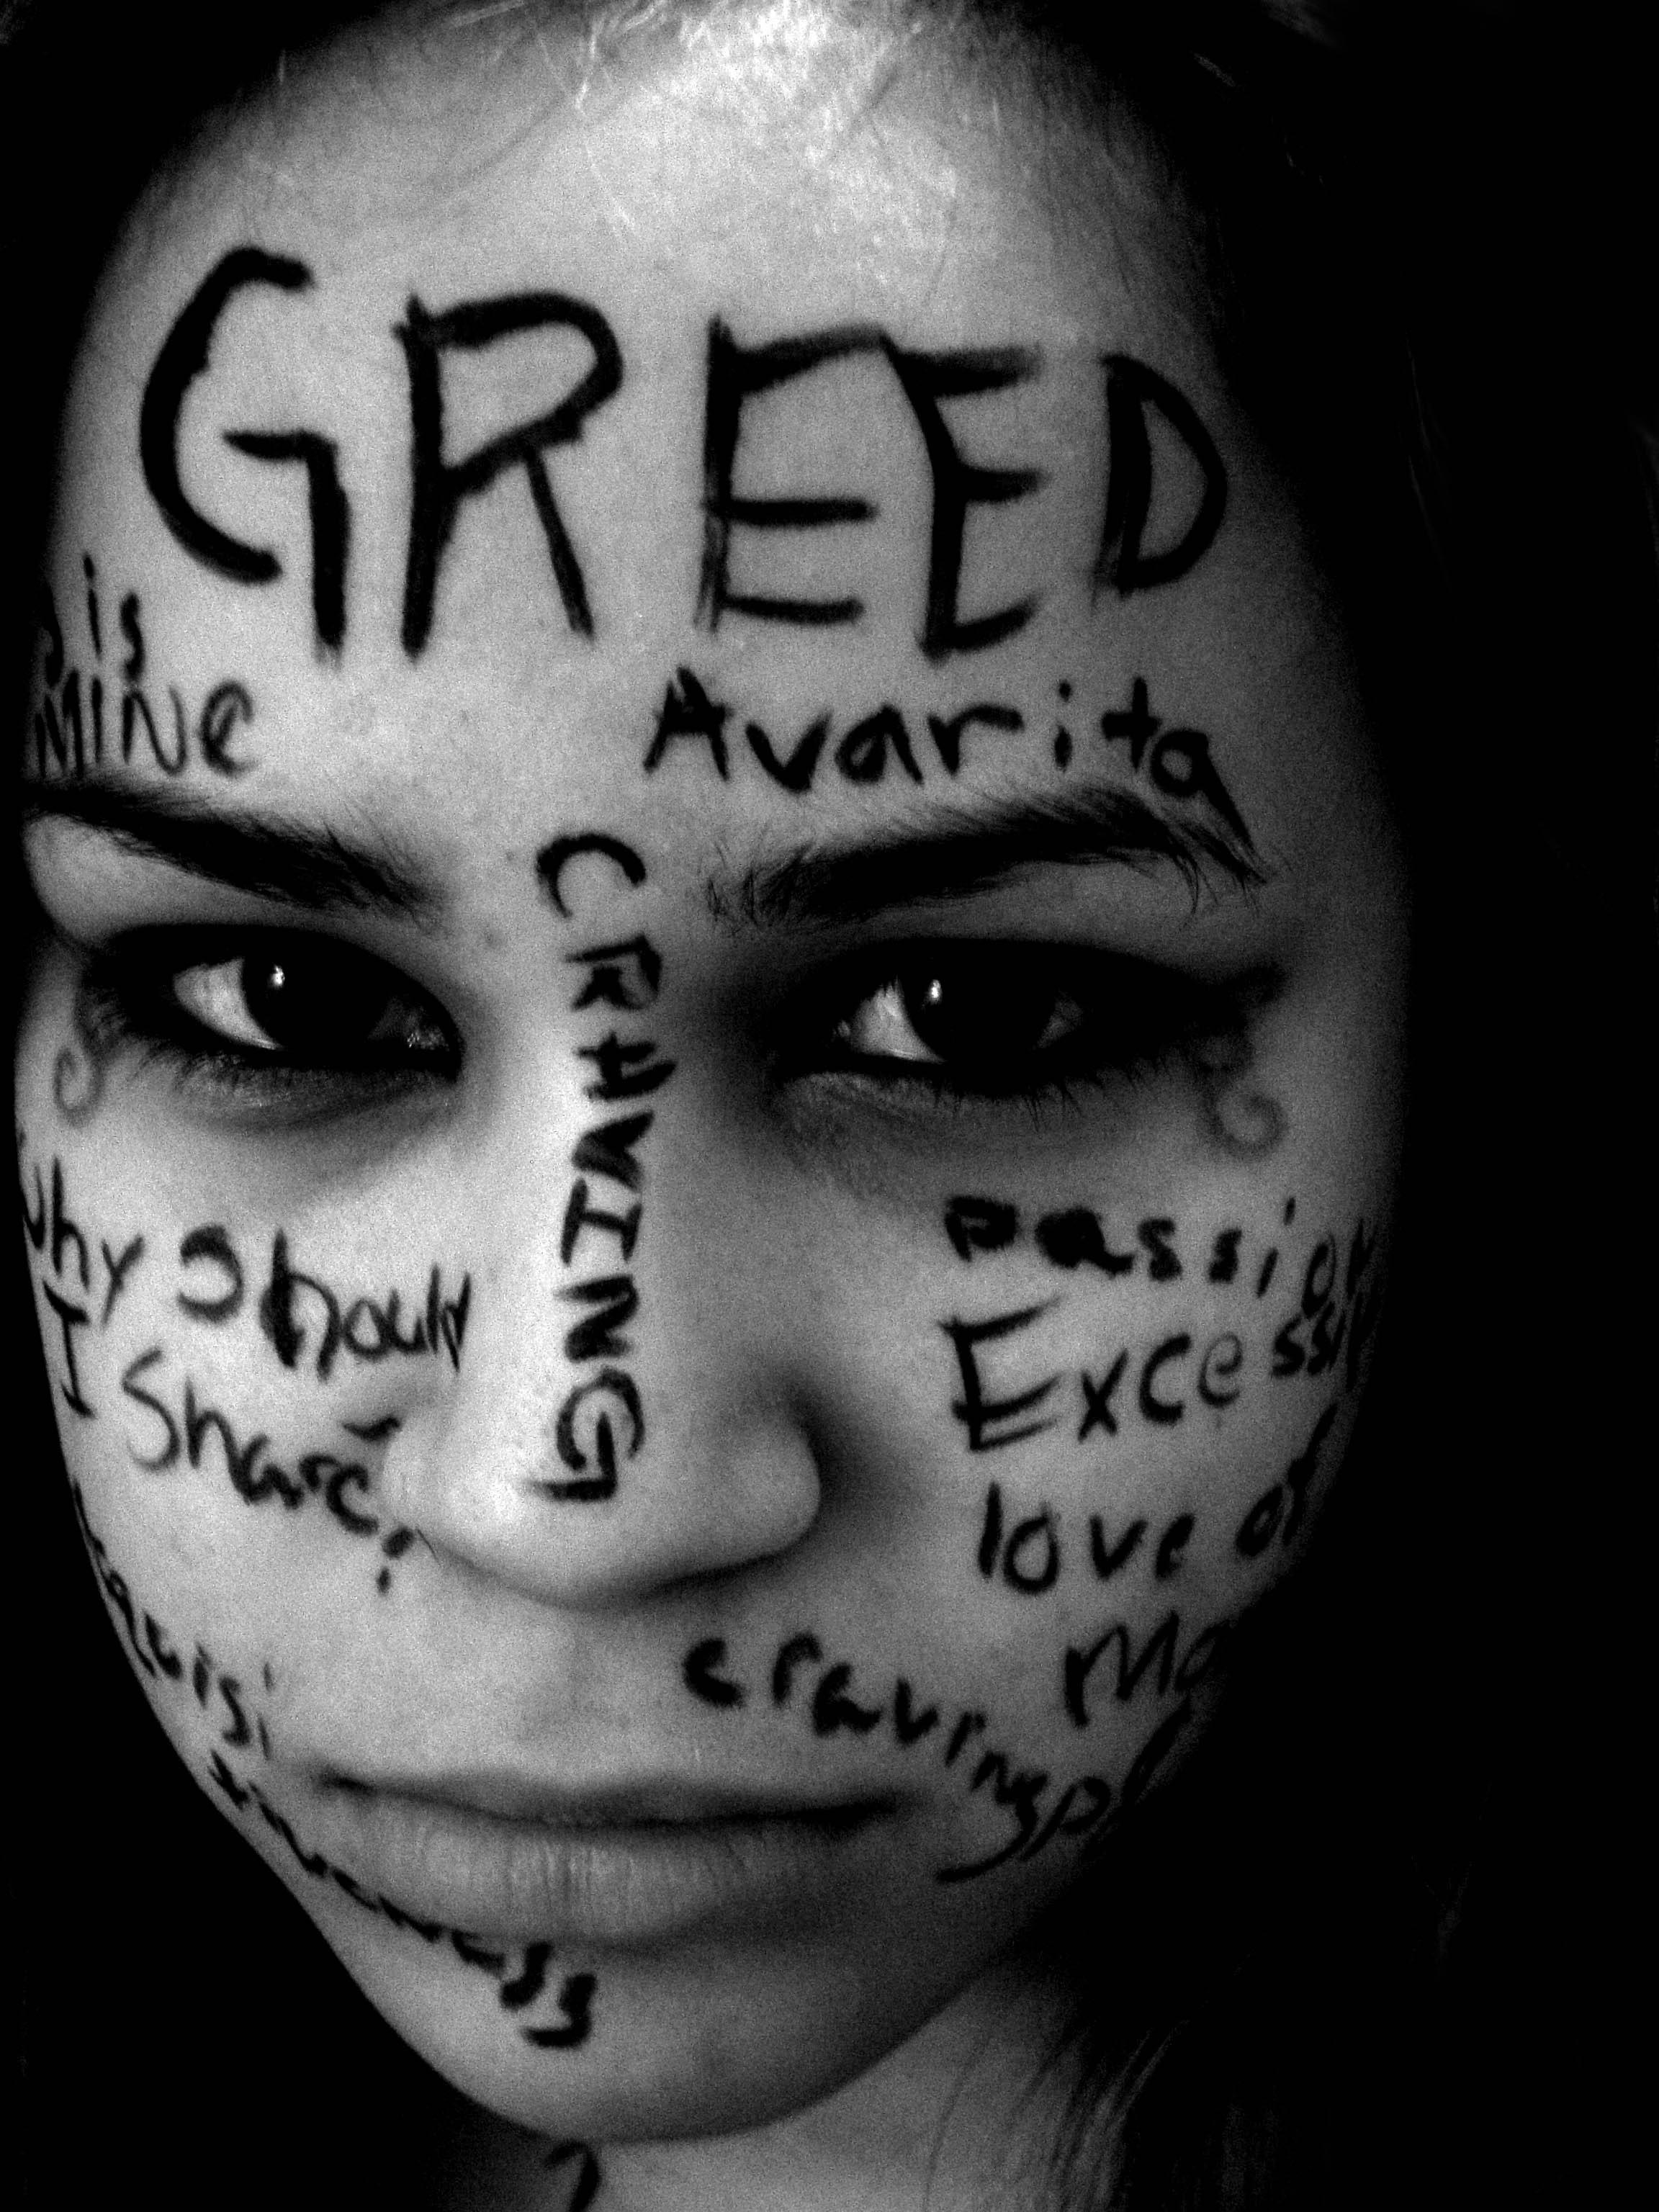 greed - photo #13